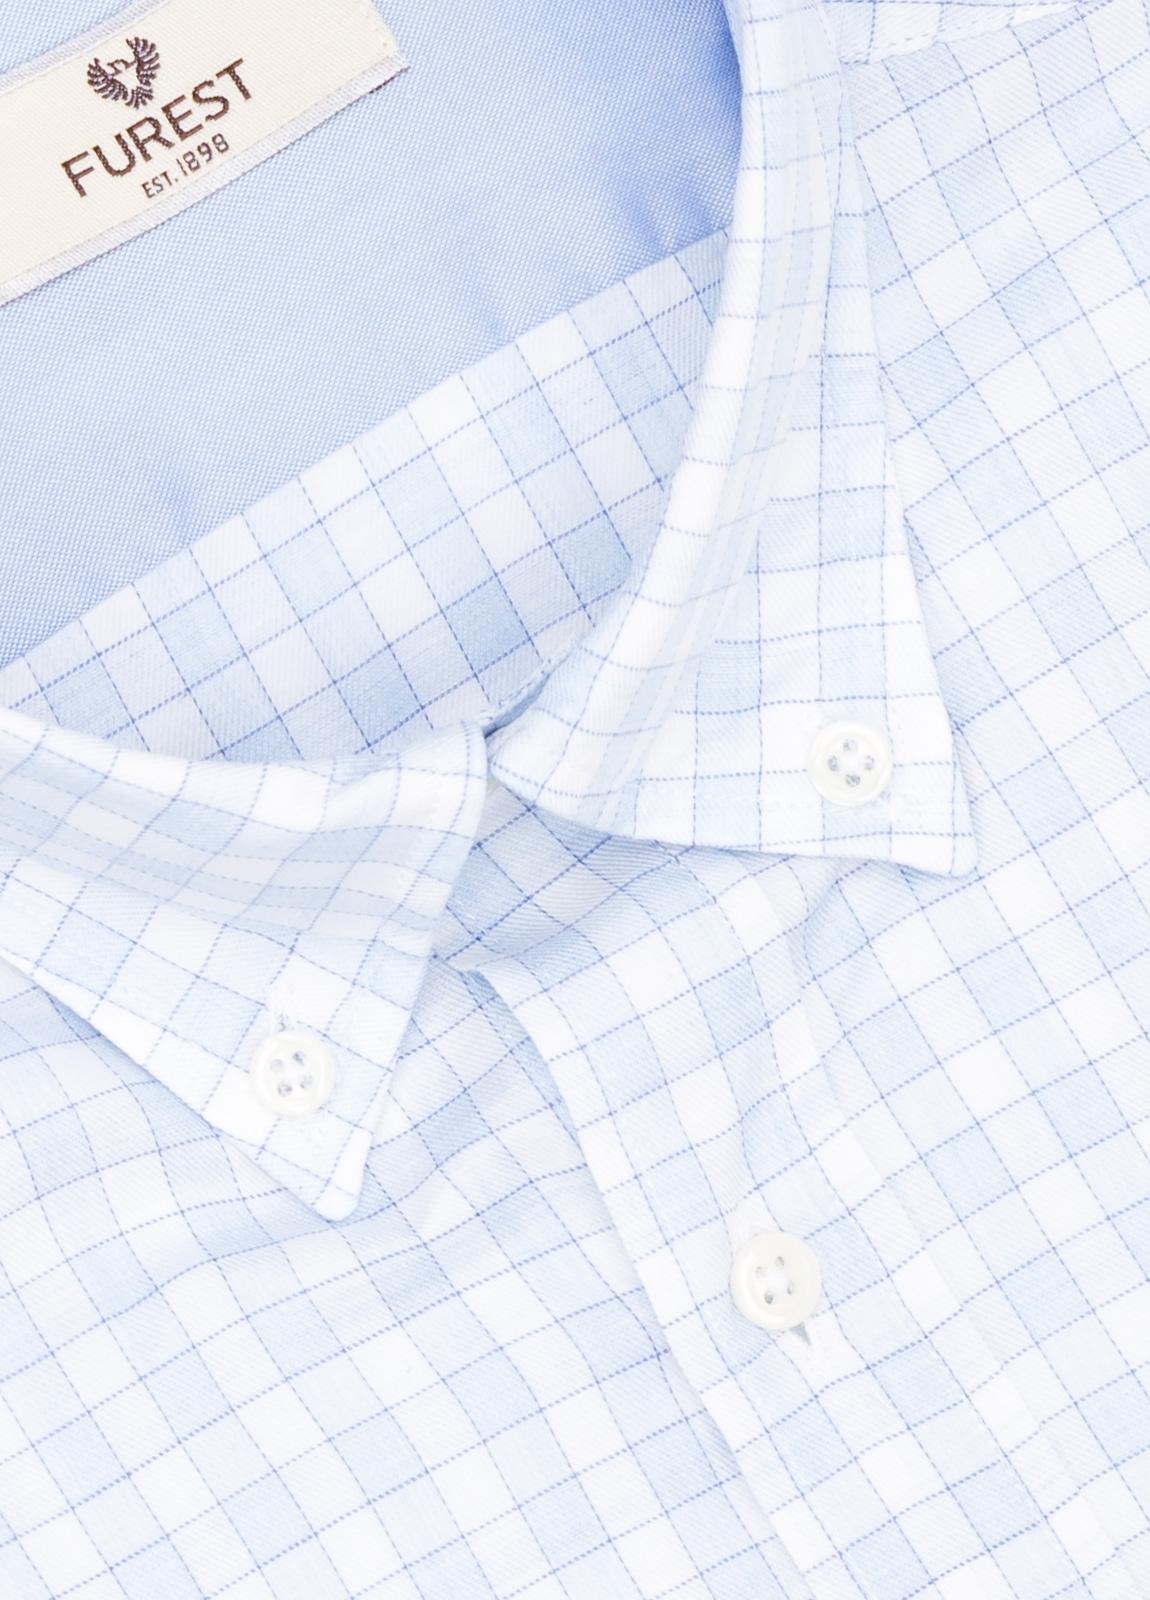 Camisa Leisure Wear REGULAR FIT Modelo BOTTON DOWN cuadros color azul celeste. 100% Algodón. - Ítem1